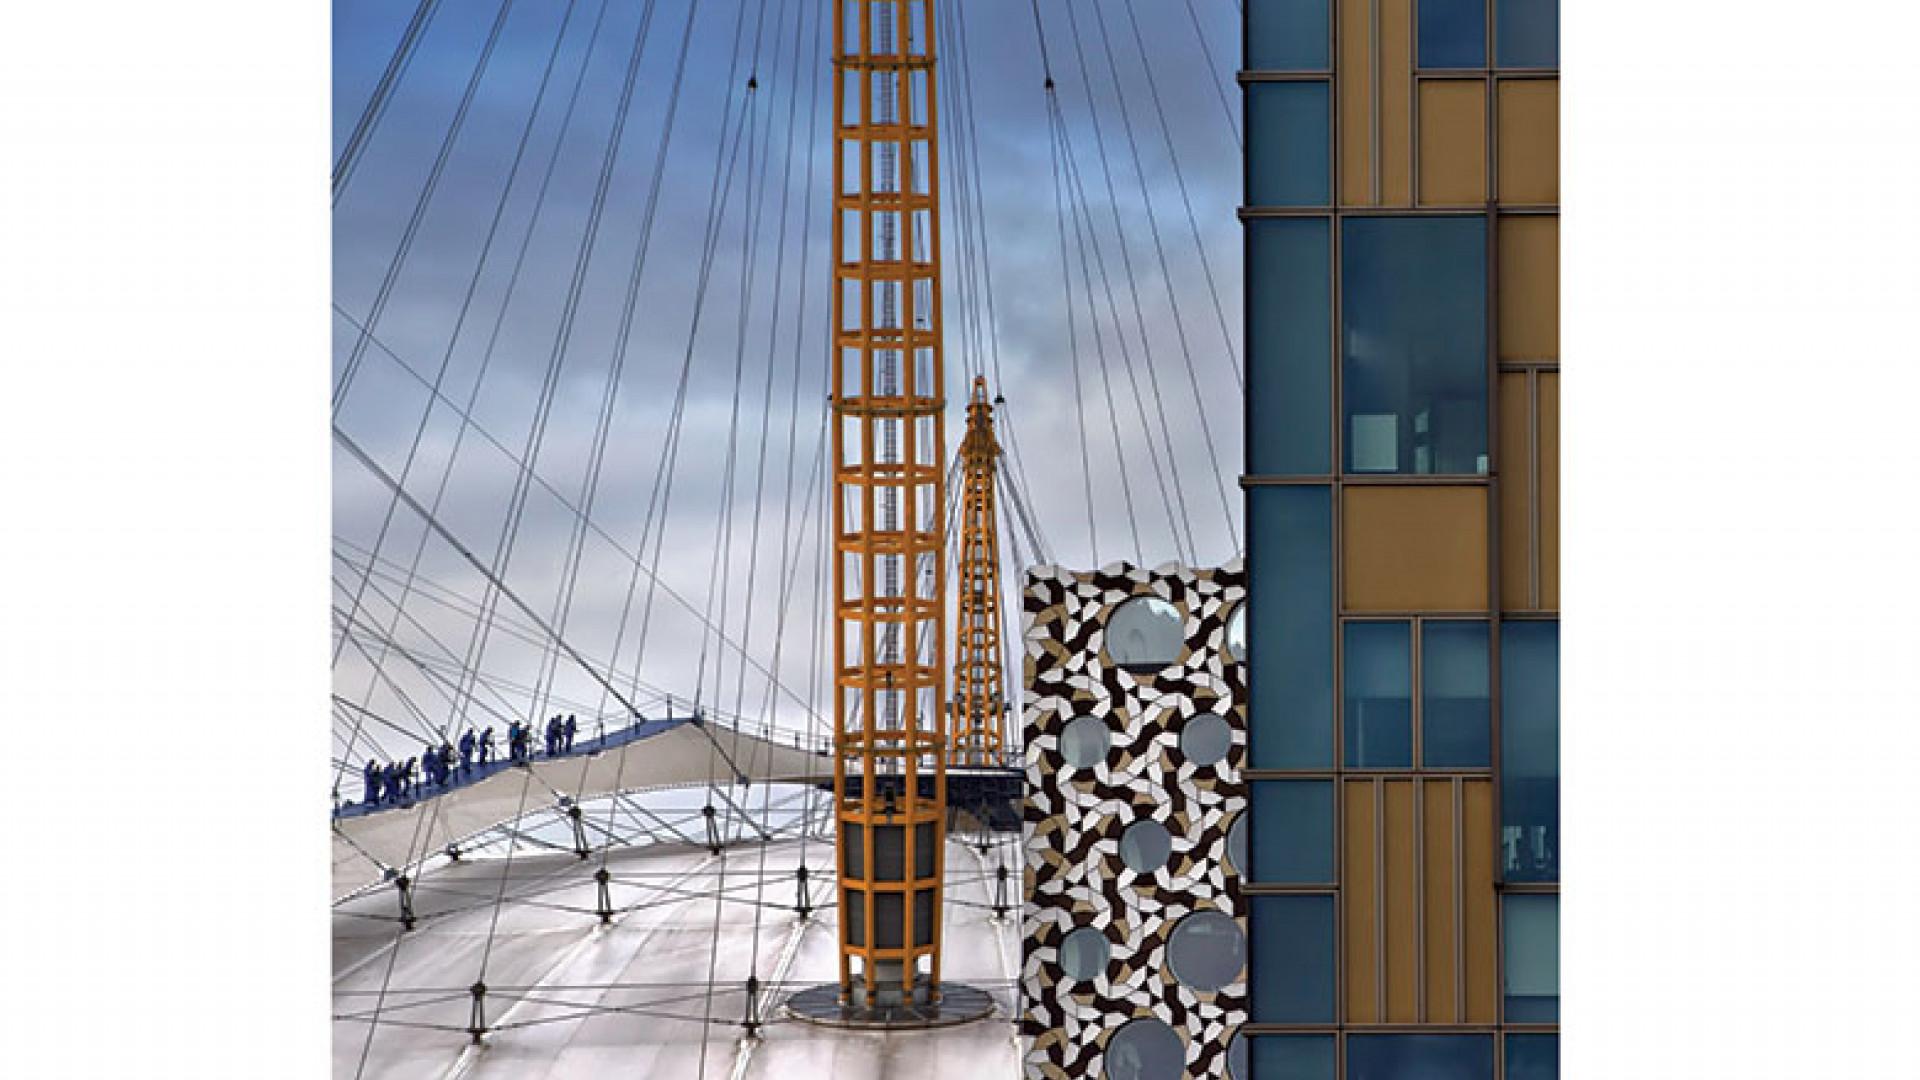 Kevin_John_Bleasdale,_UK,_Entry,_Open_Architecture,_2014_Sony_World_Photography_Awards.jpg_cmyk